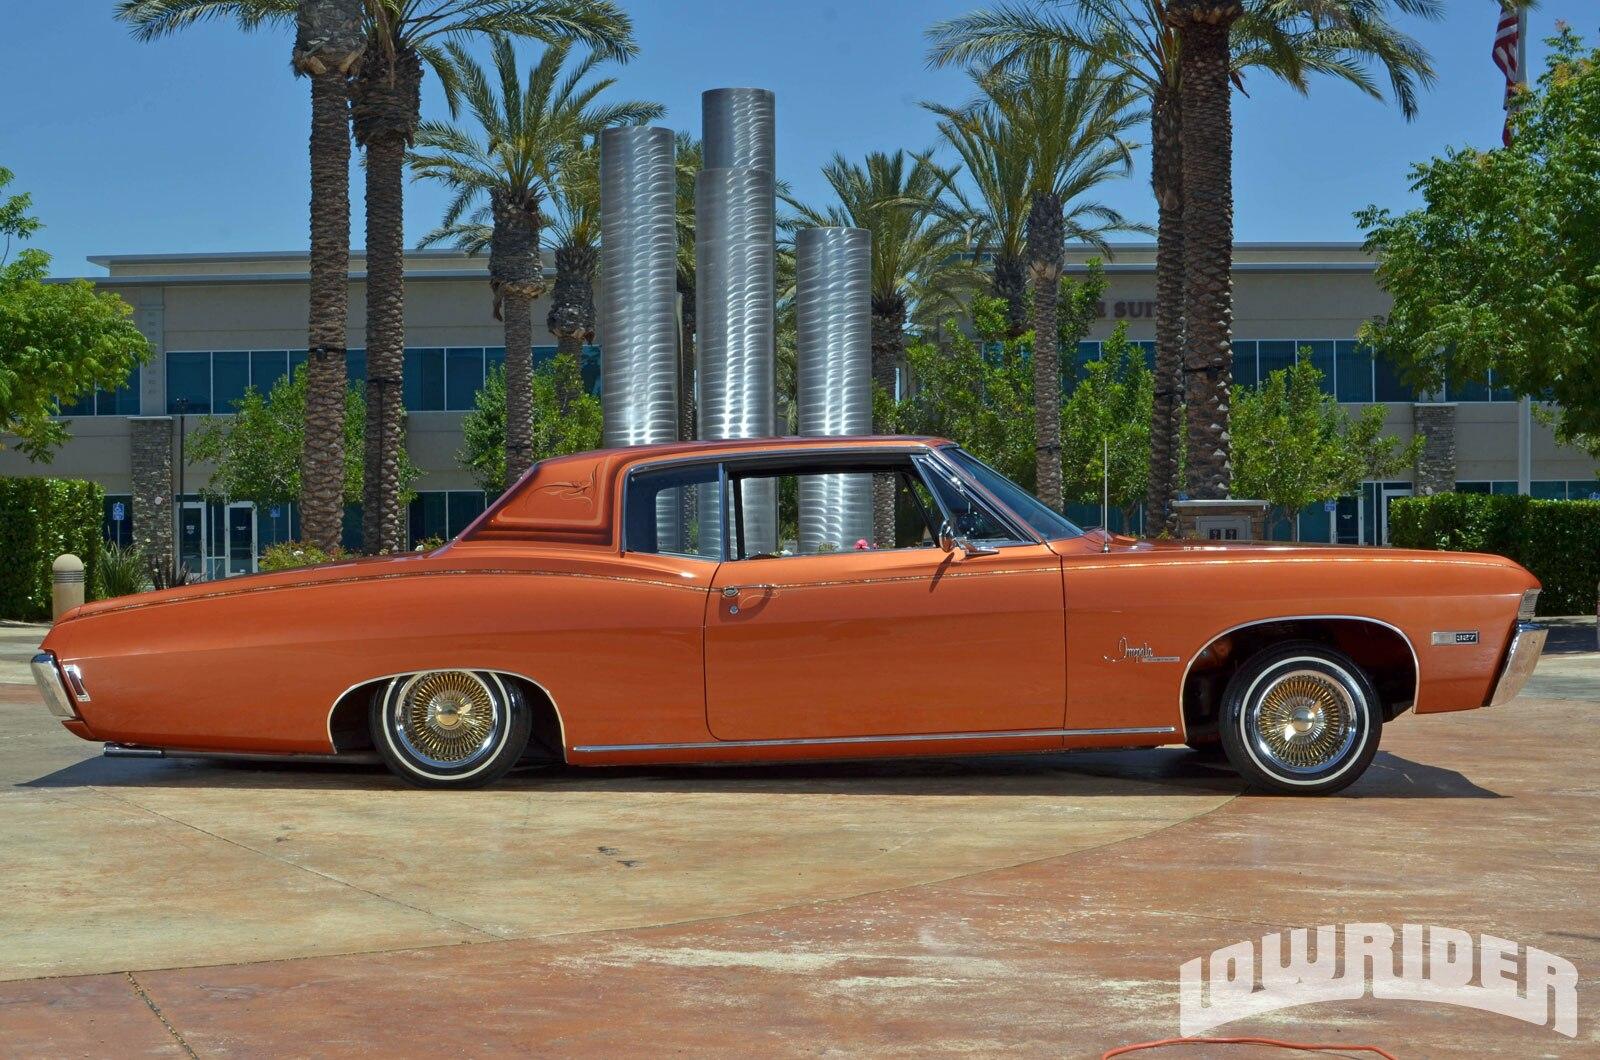 1202-lrmp-08-o-1968-chevrolet-impala-passenger-side-profile1